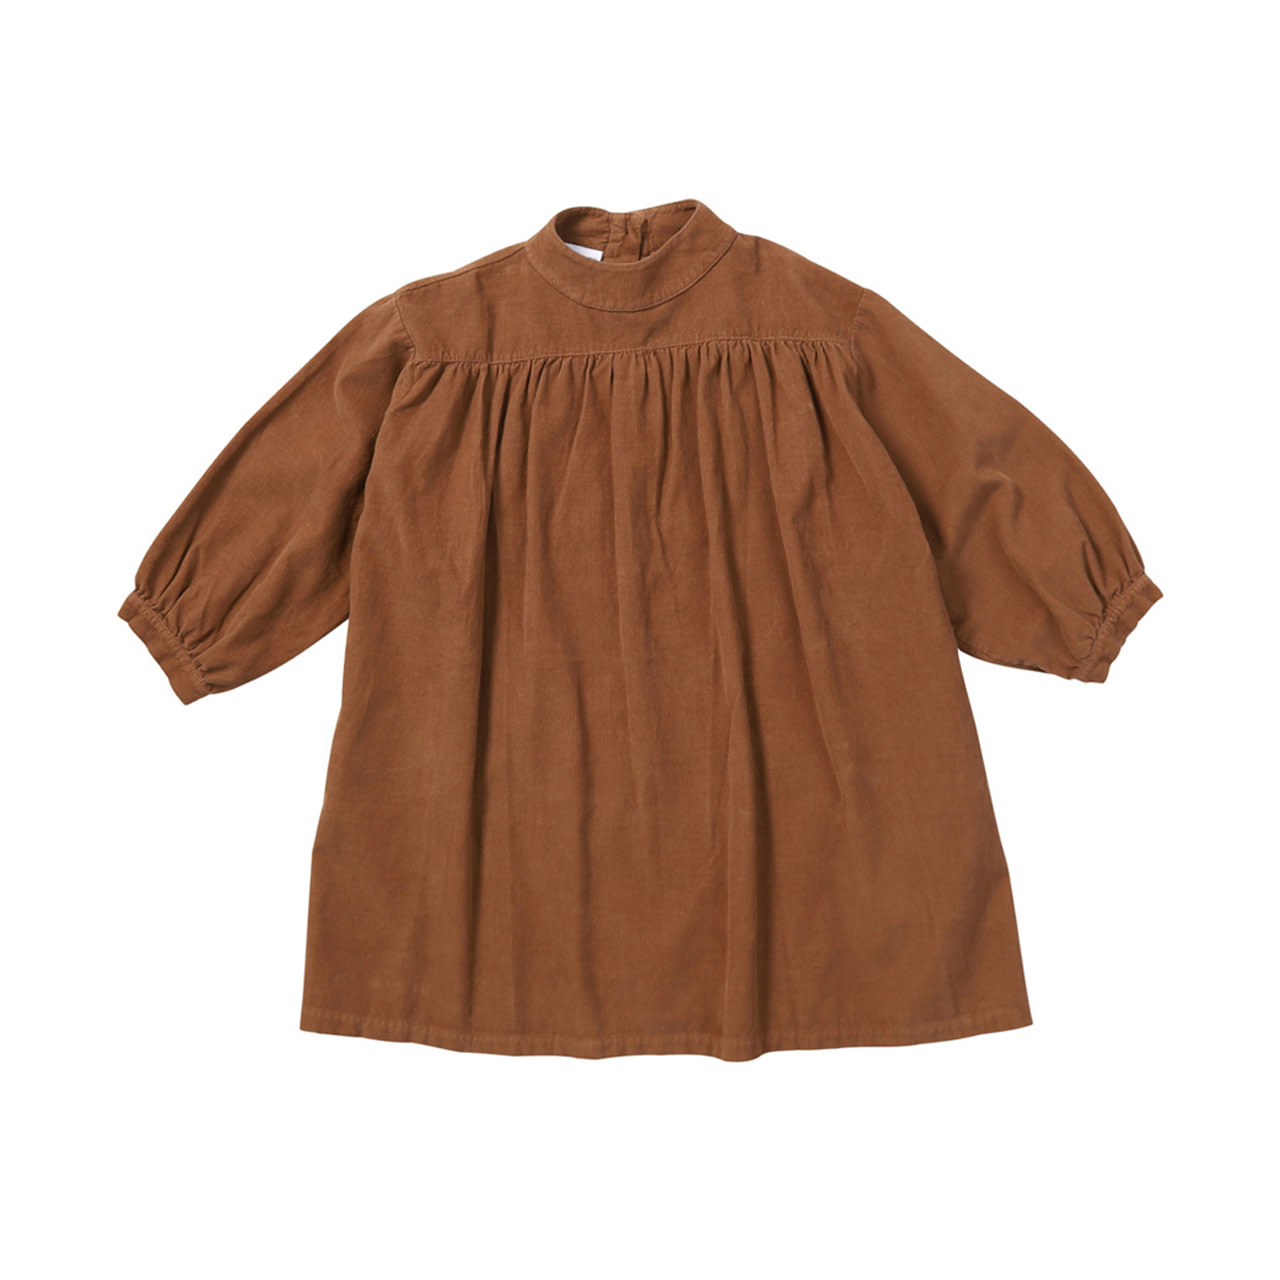 Maed For mini Maed for mini - Dress caramel coyote